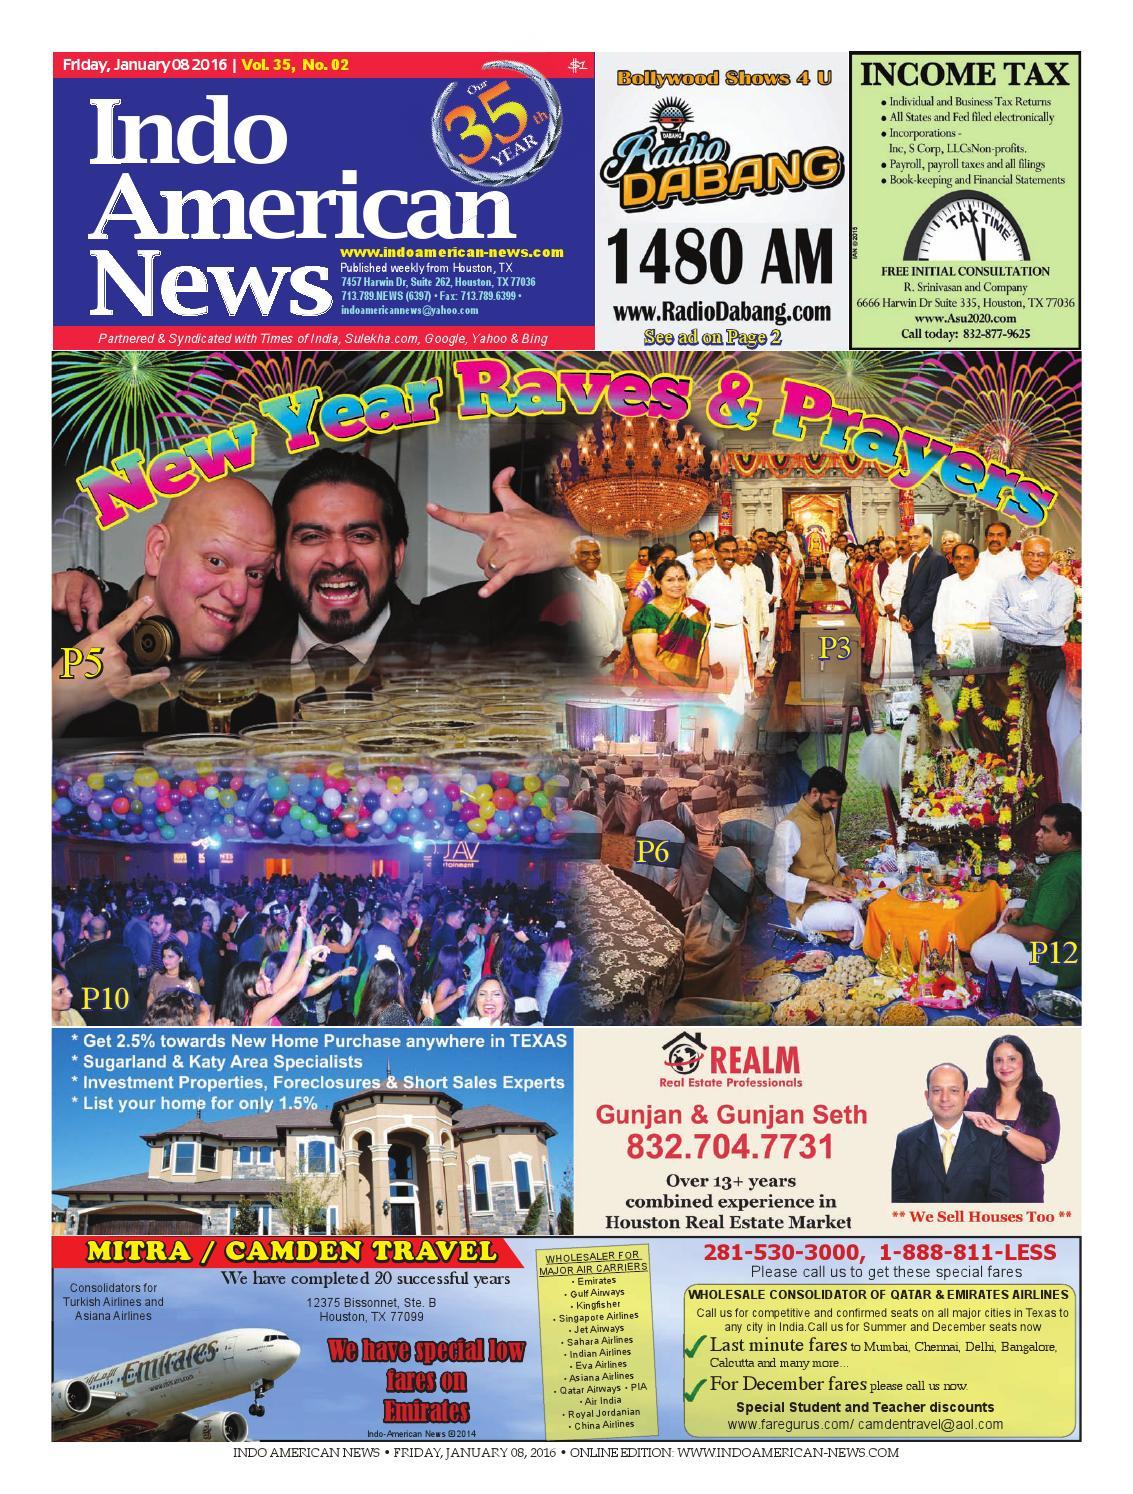 E newspaper01082016 by Indo American News - issuu